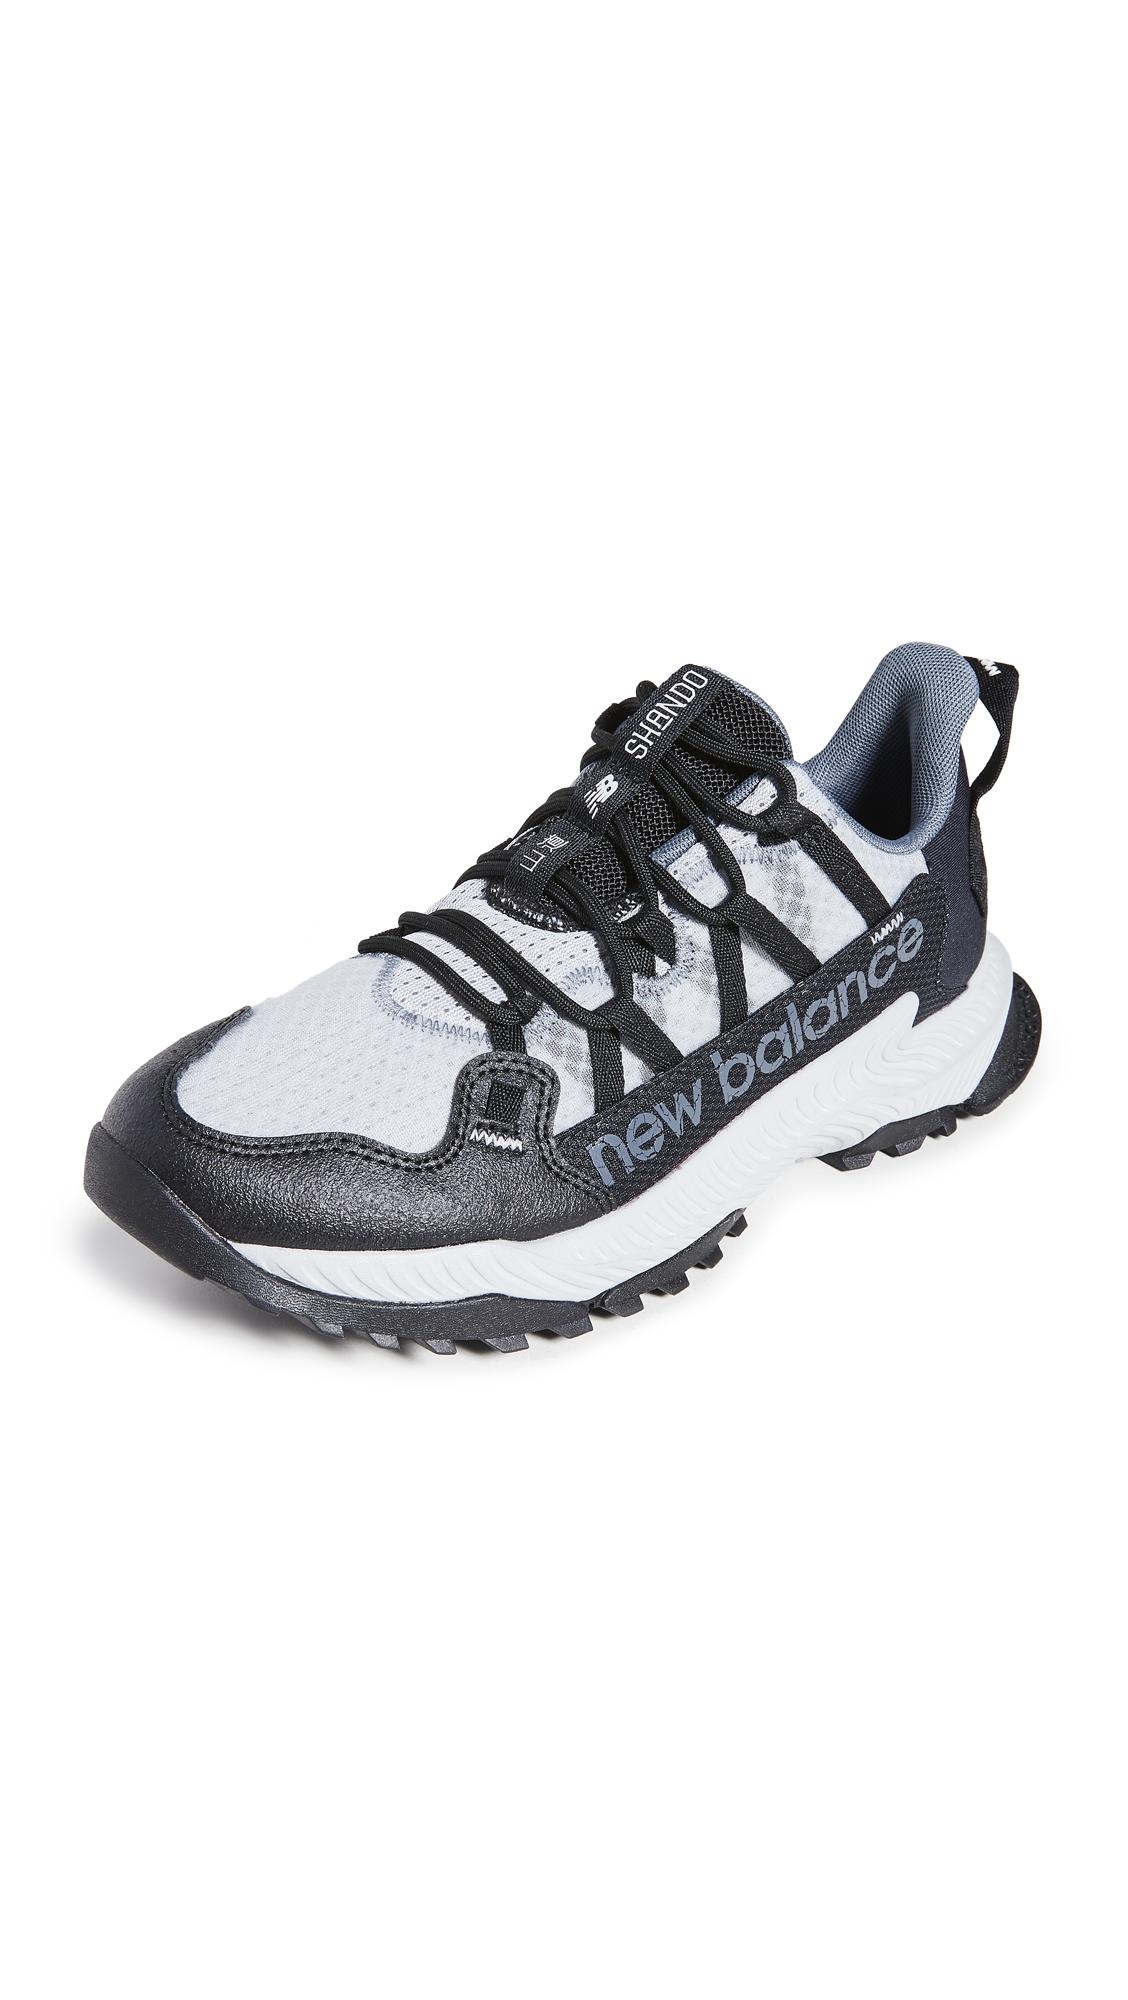 New Balance Shando Sneakers